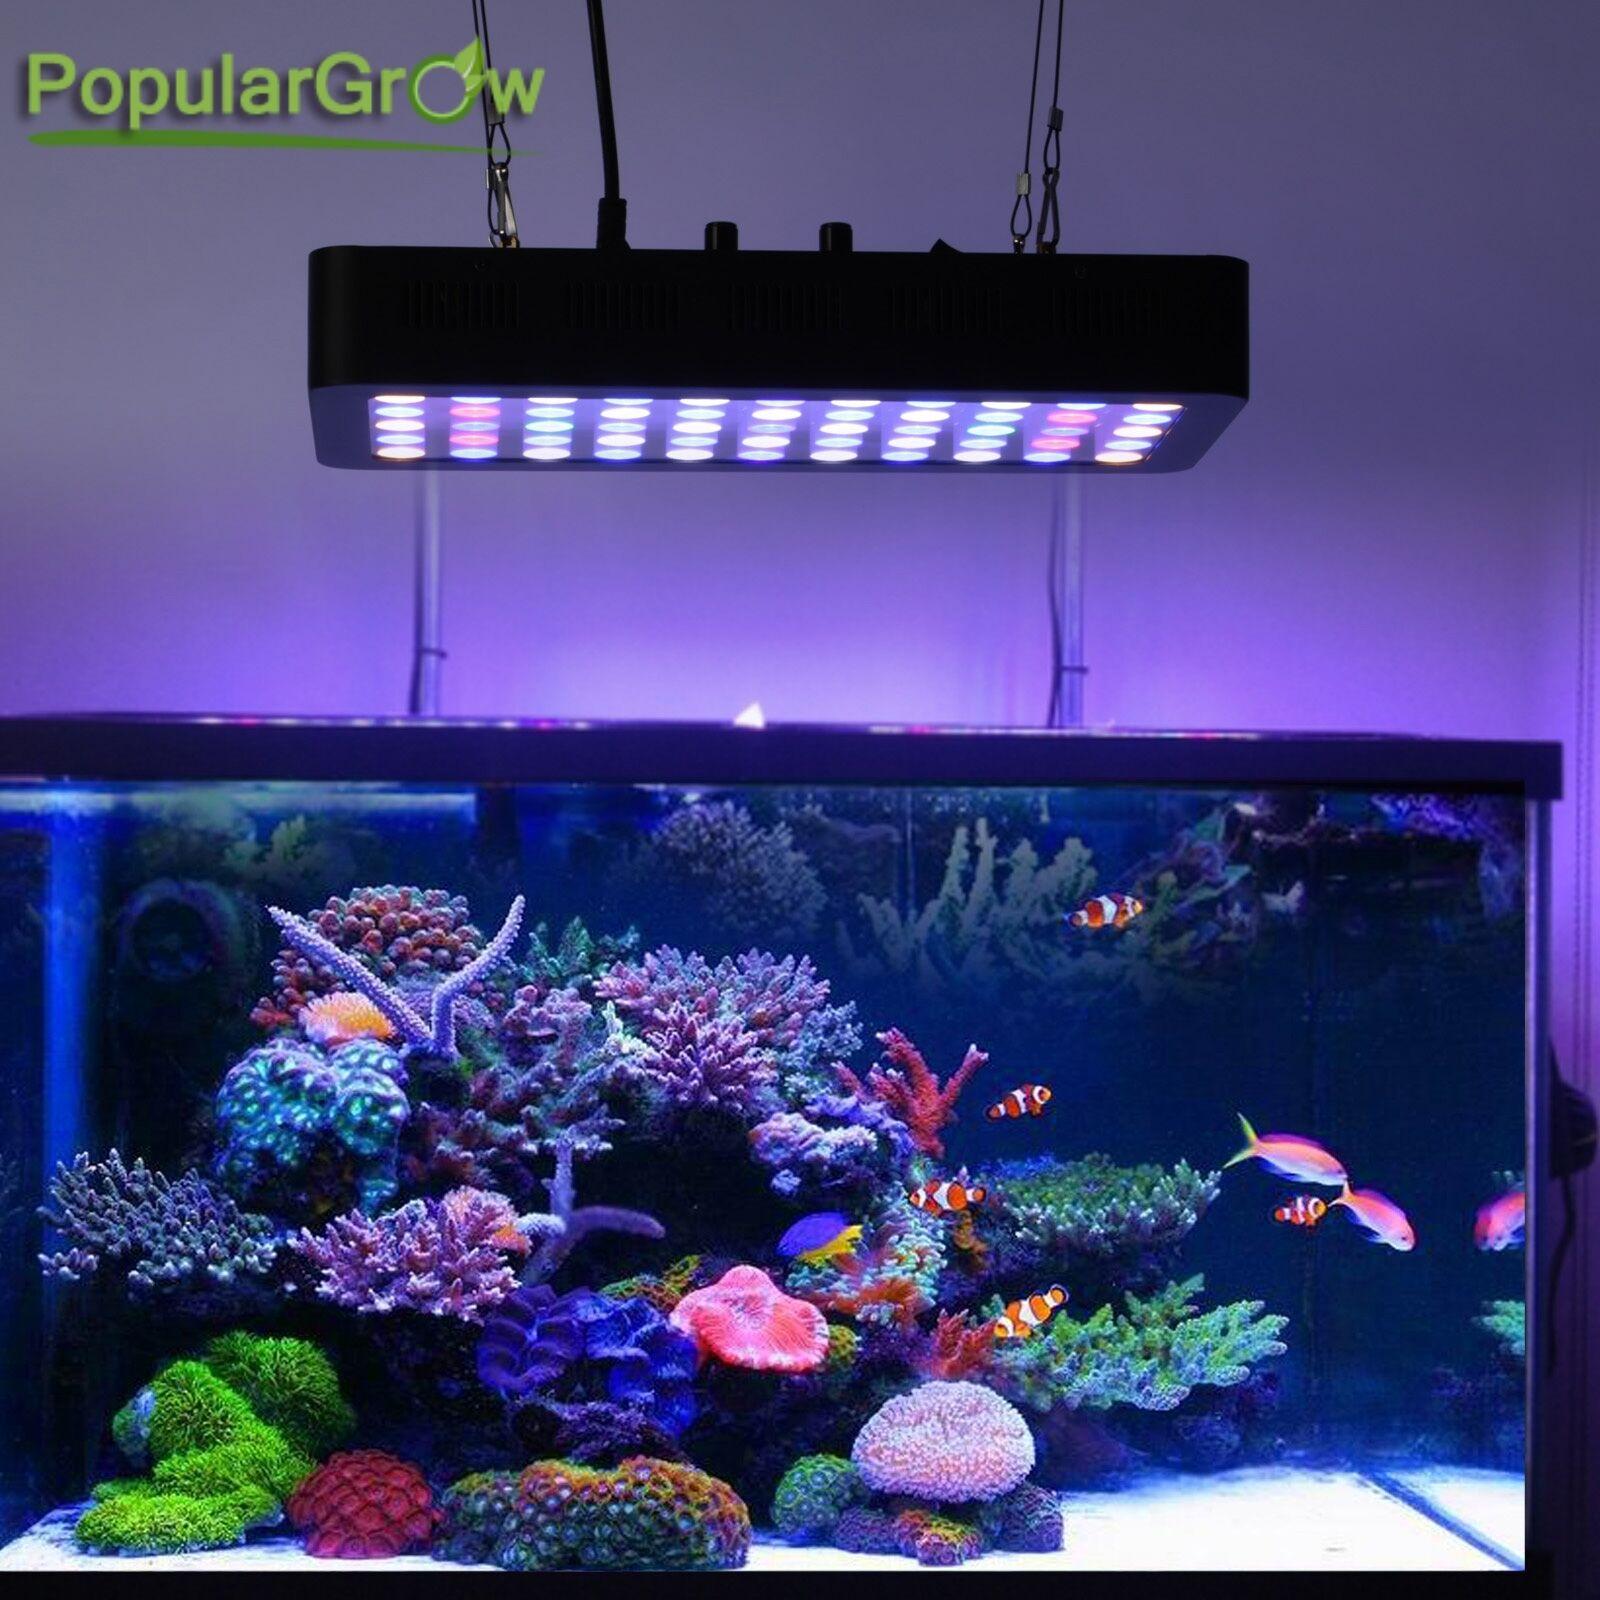 165W Wifi LED Aquarium Light Full Spectrum Dimmable Fish Tank Coral Lamp US Plug